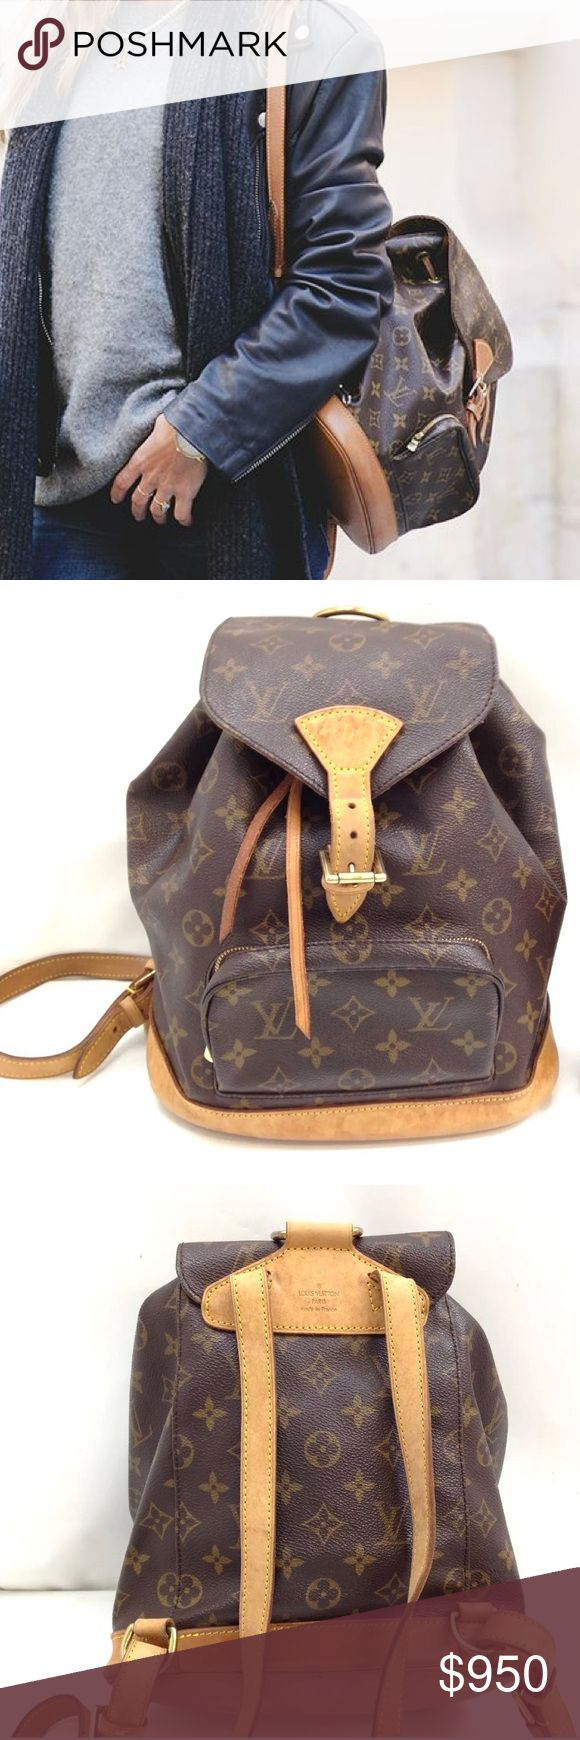 Auth Louis Vuitton Montsouris MM Backpack Bag Bags